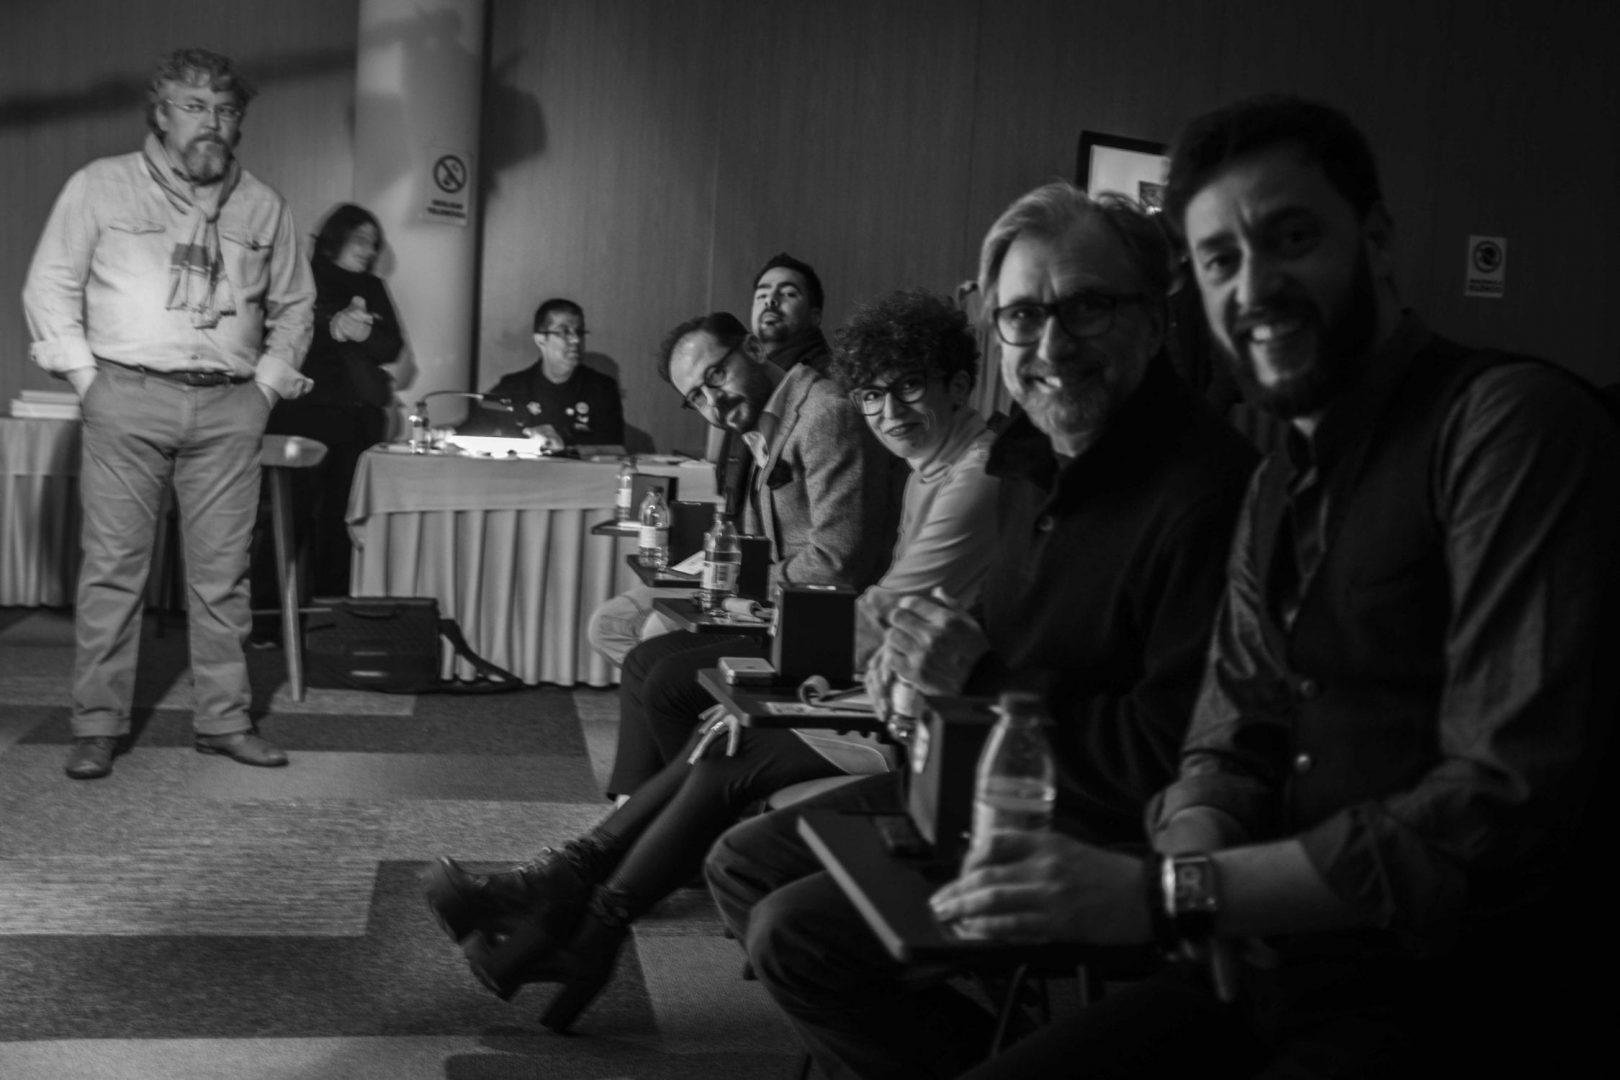 POV from the jury chair. In order: Roberto Lengua, Andre Boto, Nelson Marques, Yolanda Purrinos, and Fernando Algarvio.